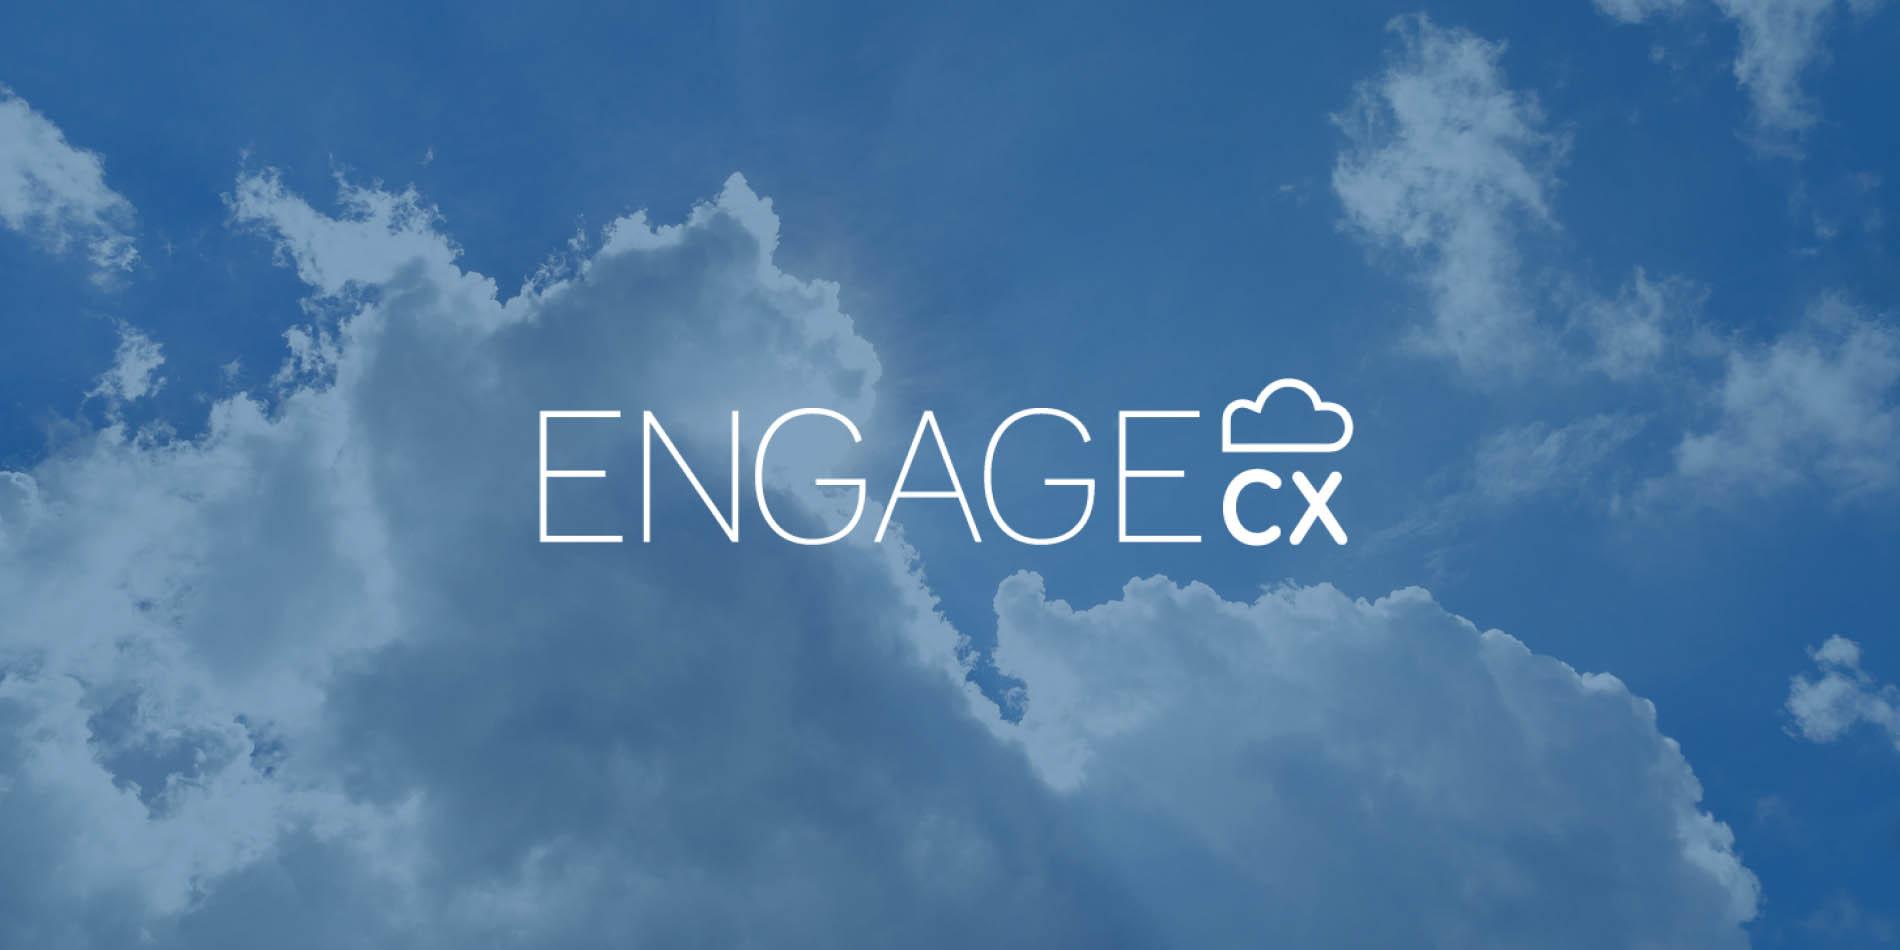 engage cx